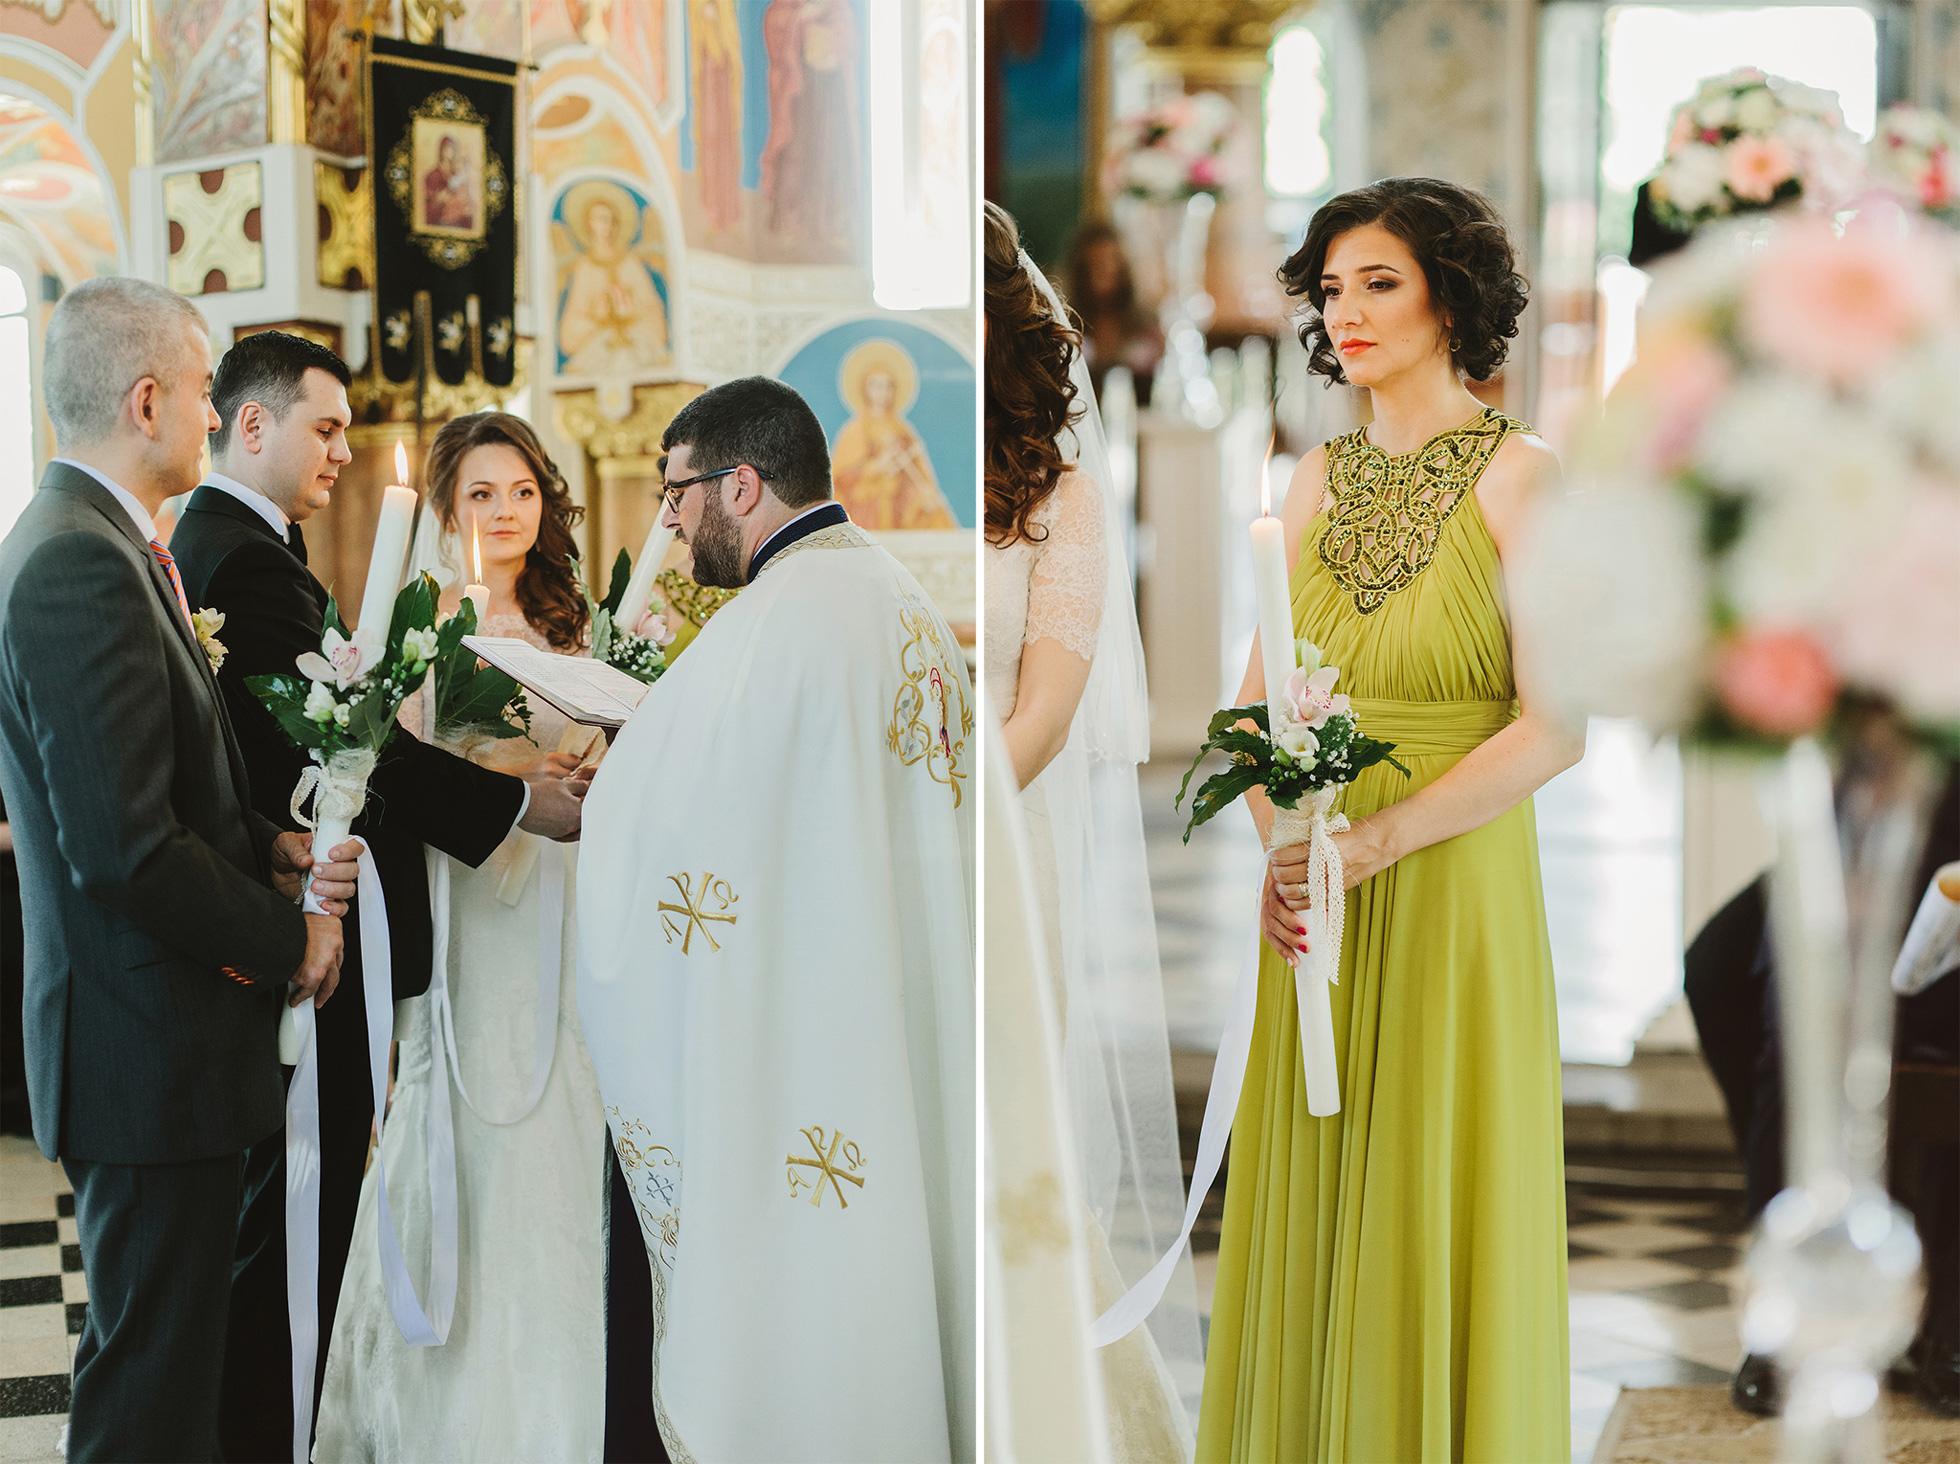 Liana-+-Florin-{wedding}-082